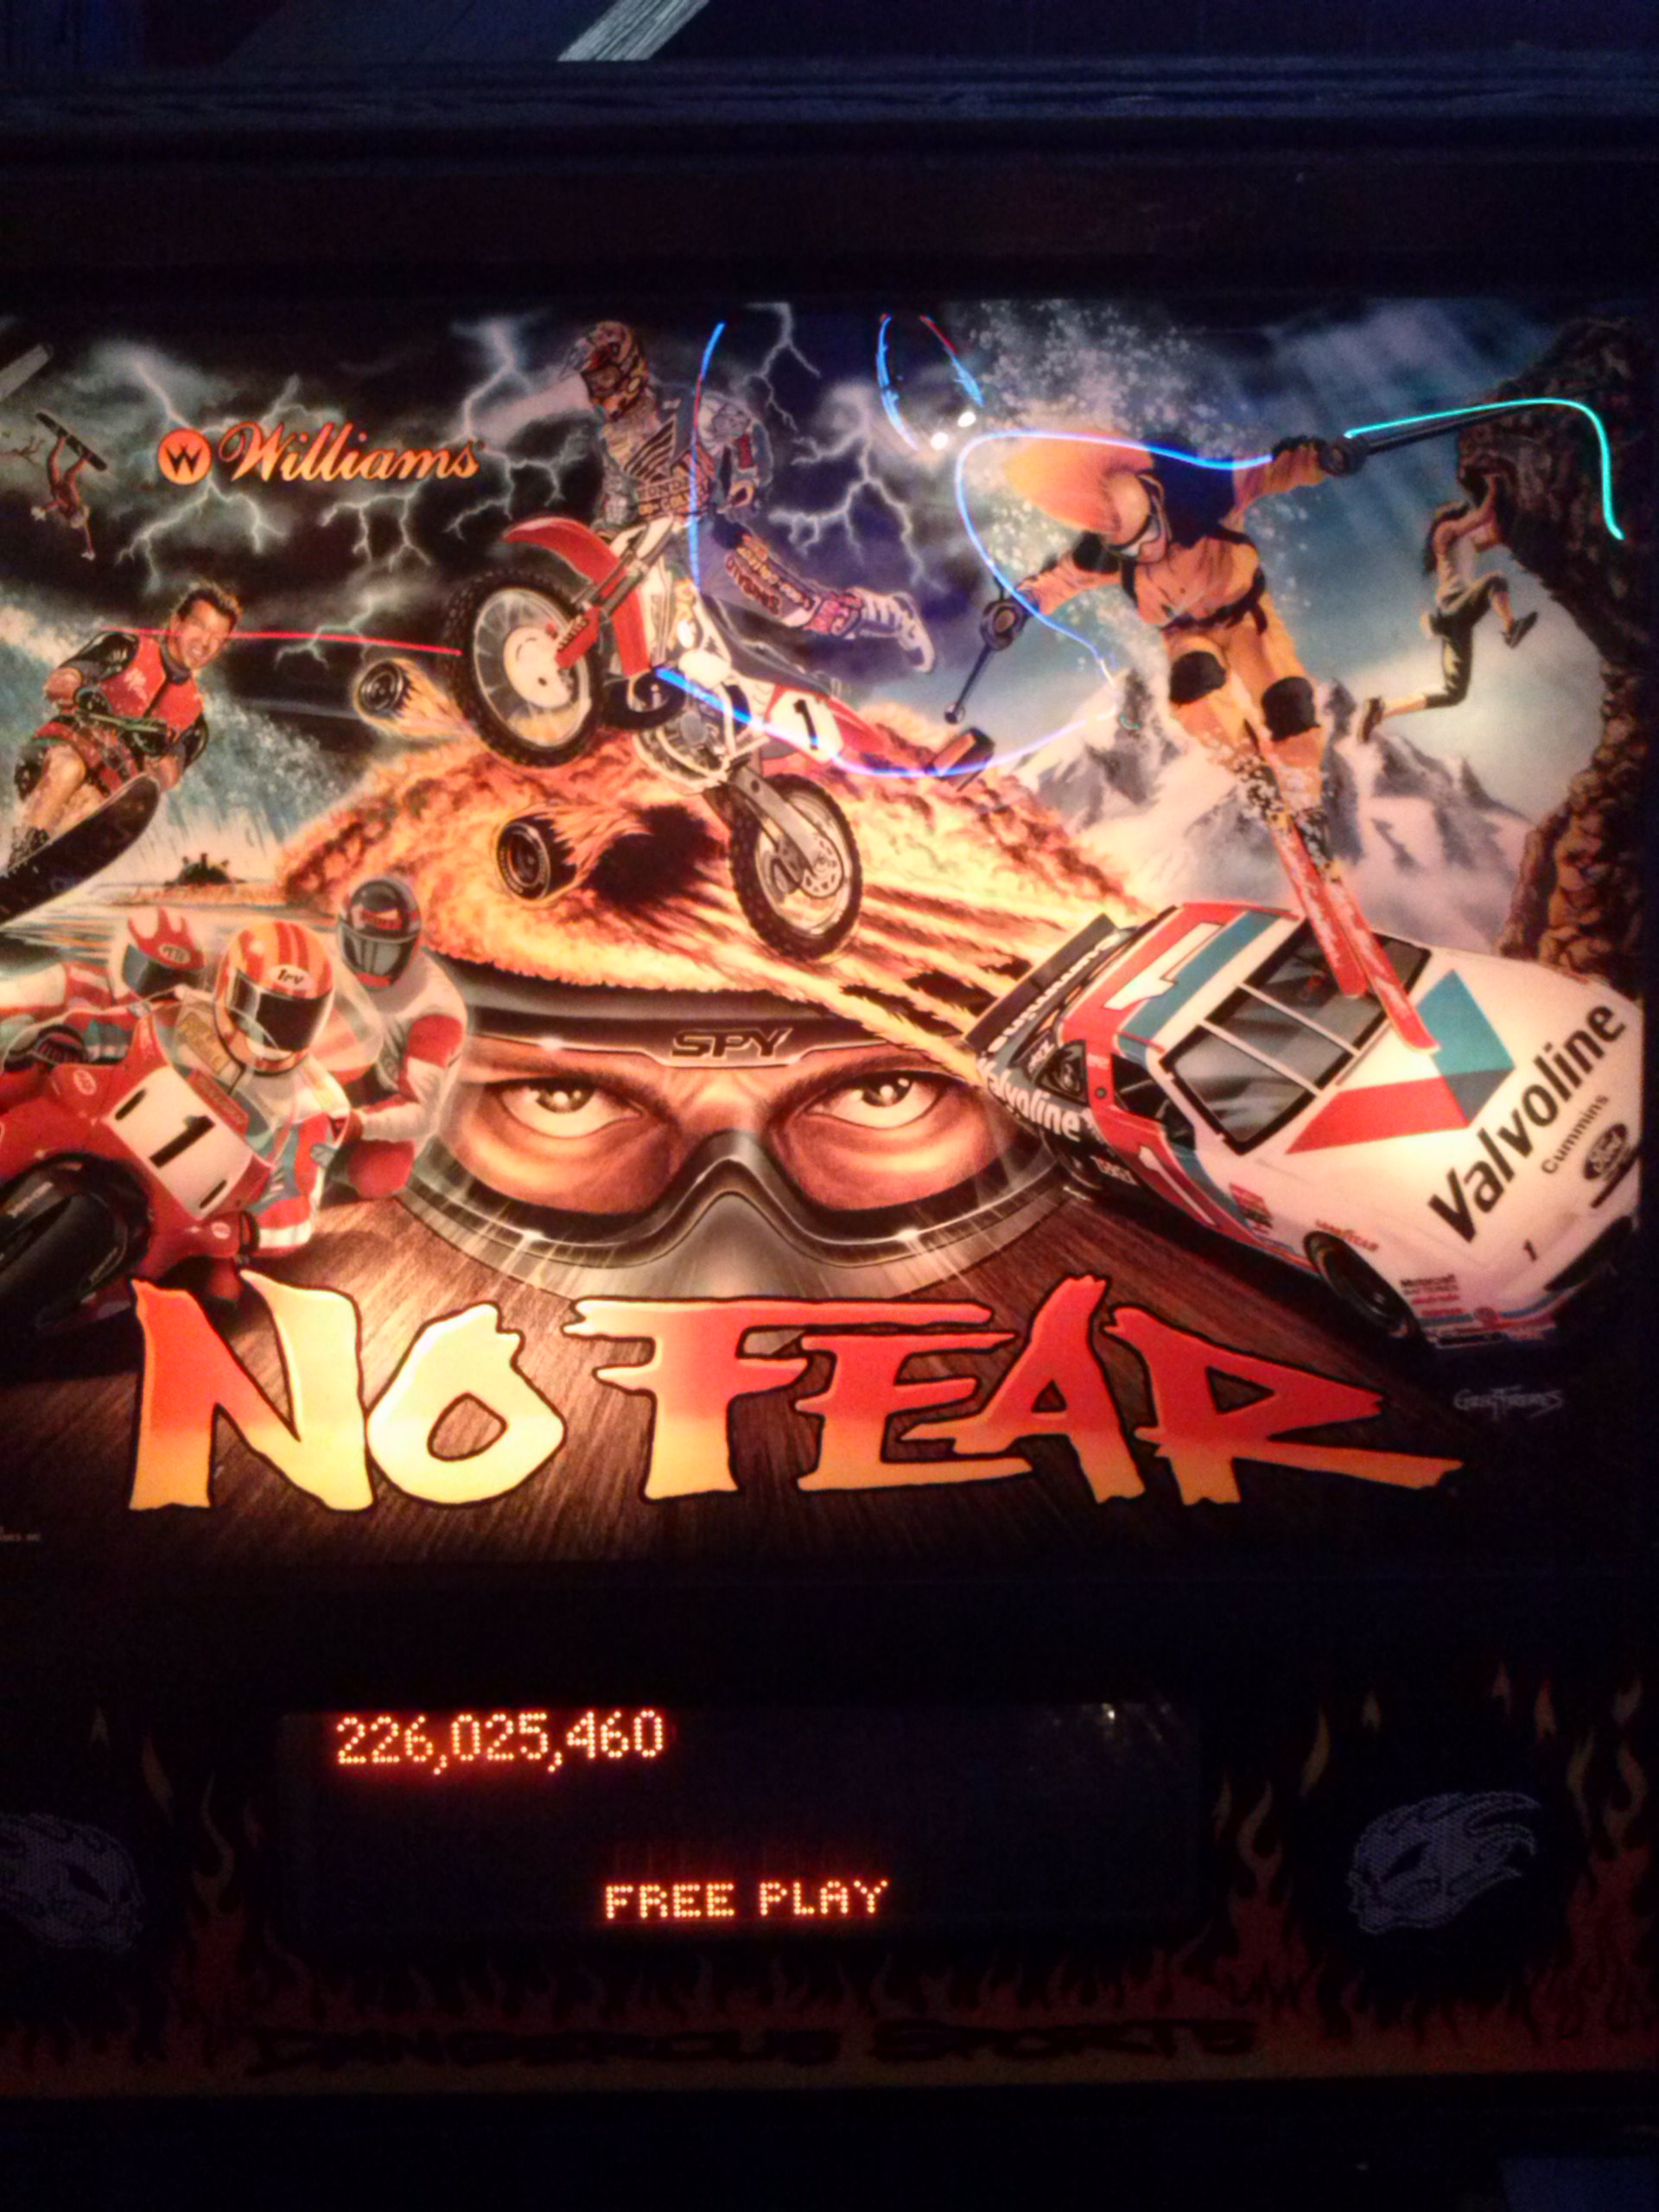 nester: No Fear: Dangerous Sports (Pinball: 3 Balls) 226,025,460 points on 2014-05-25 00:56:48